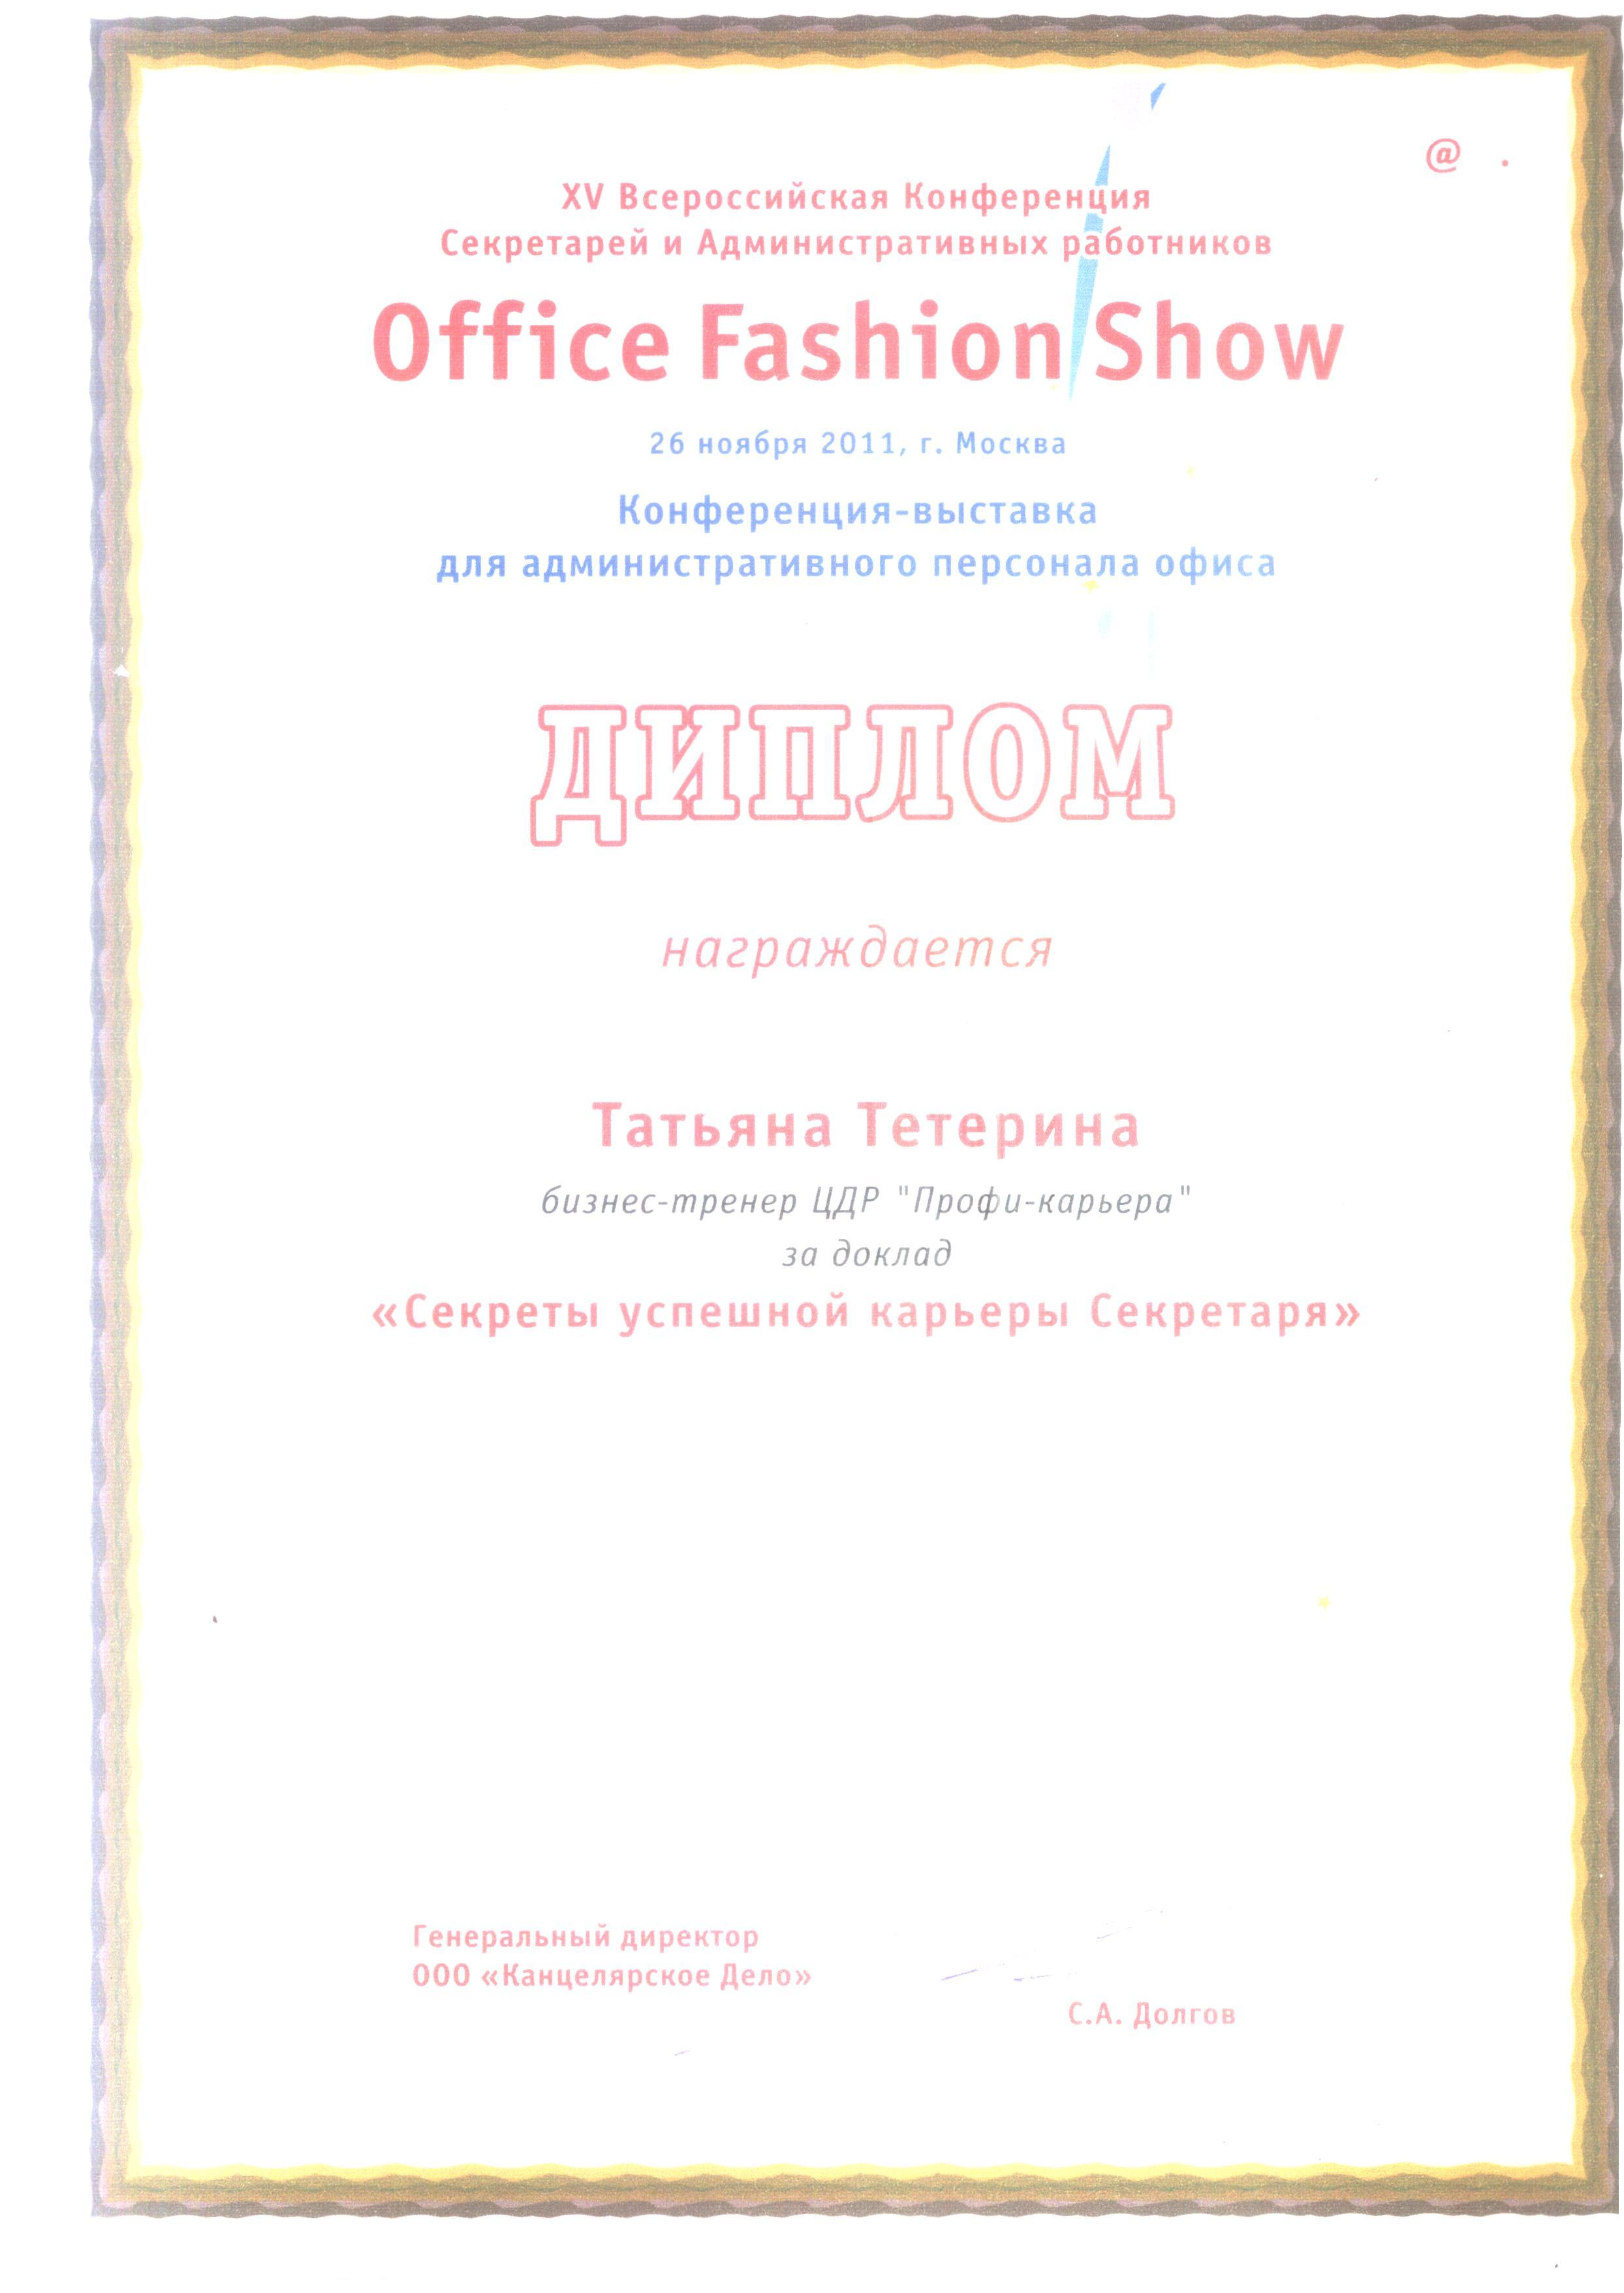 Teterina-diplom